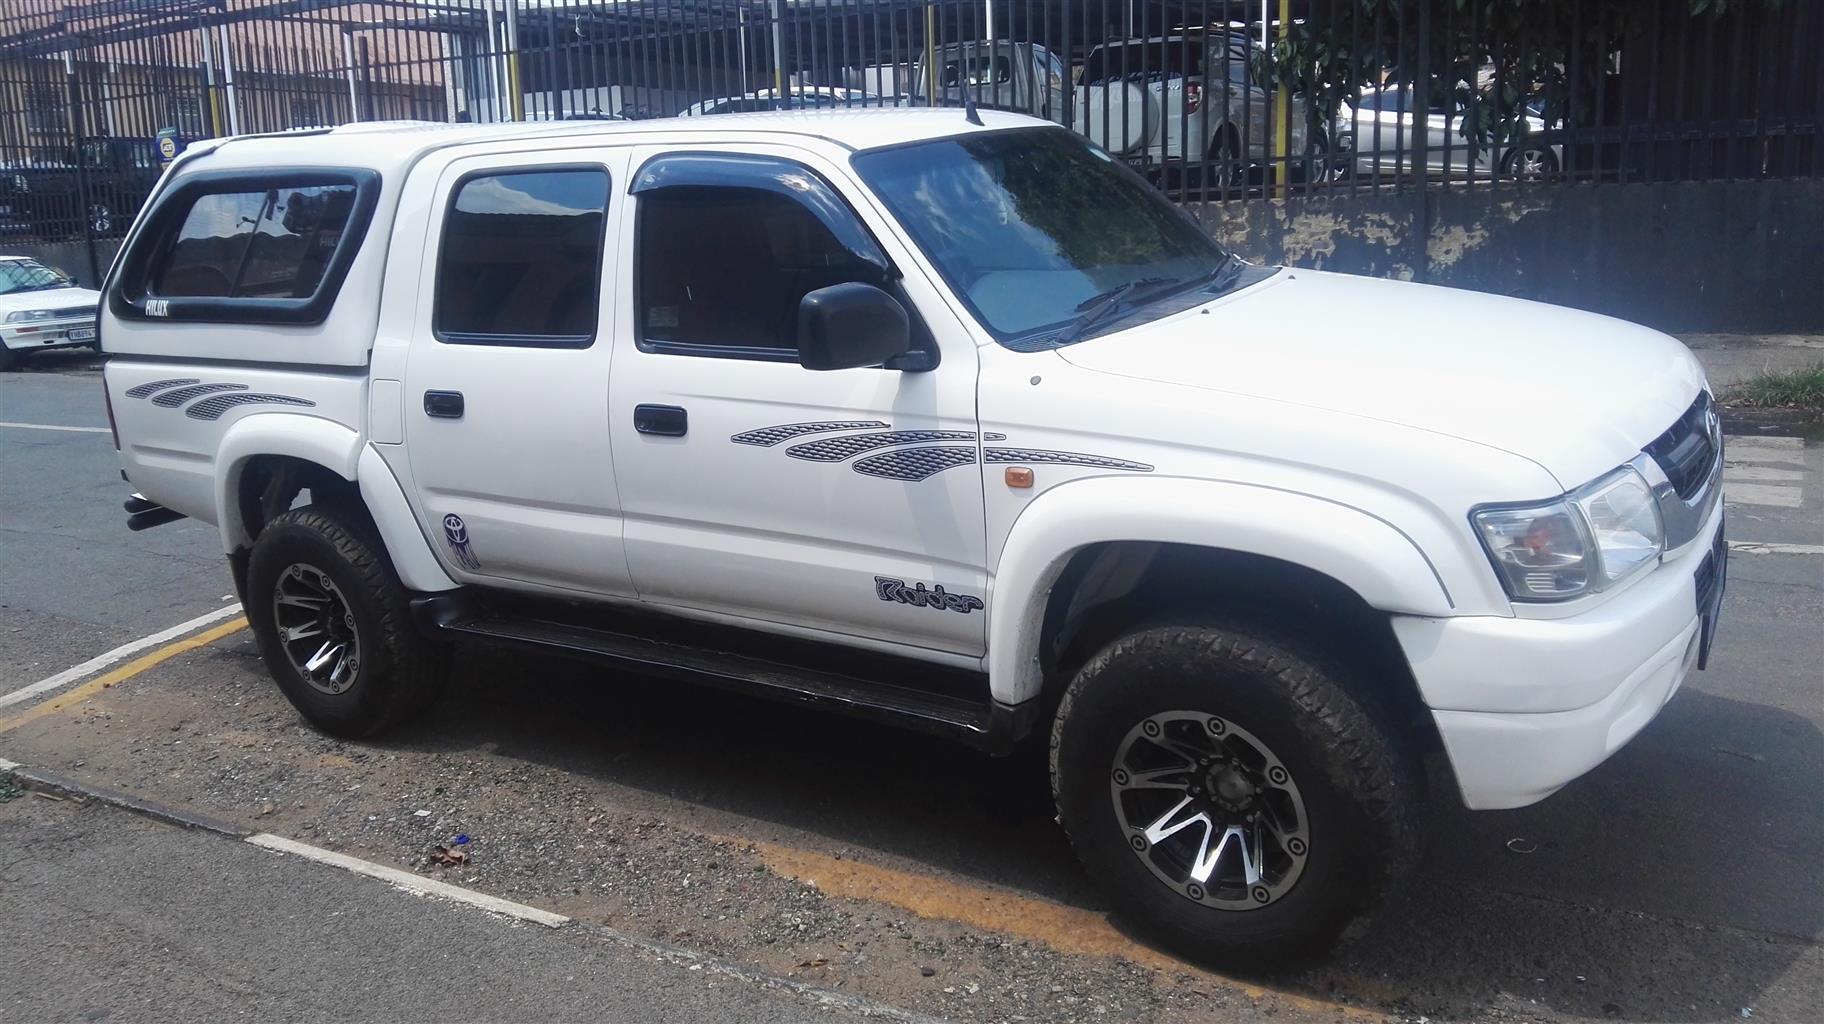 Kelebihan Kekurangan Toyota Hilux 2003 Harga